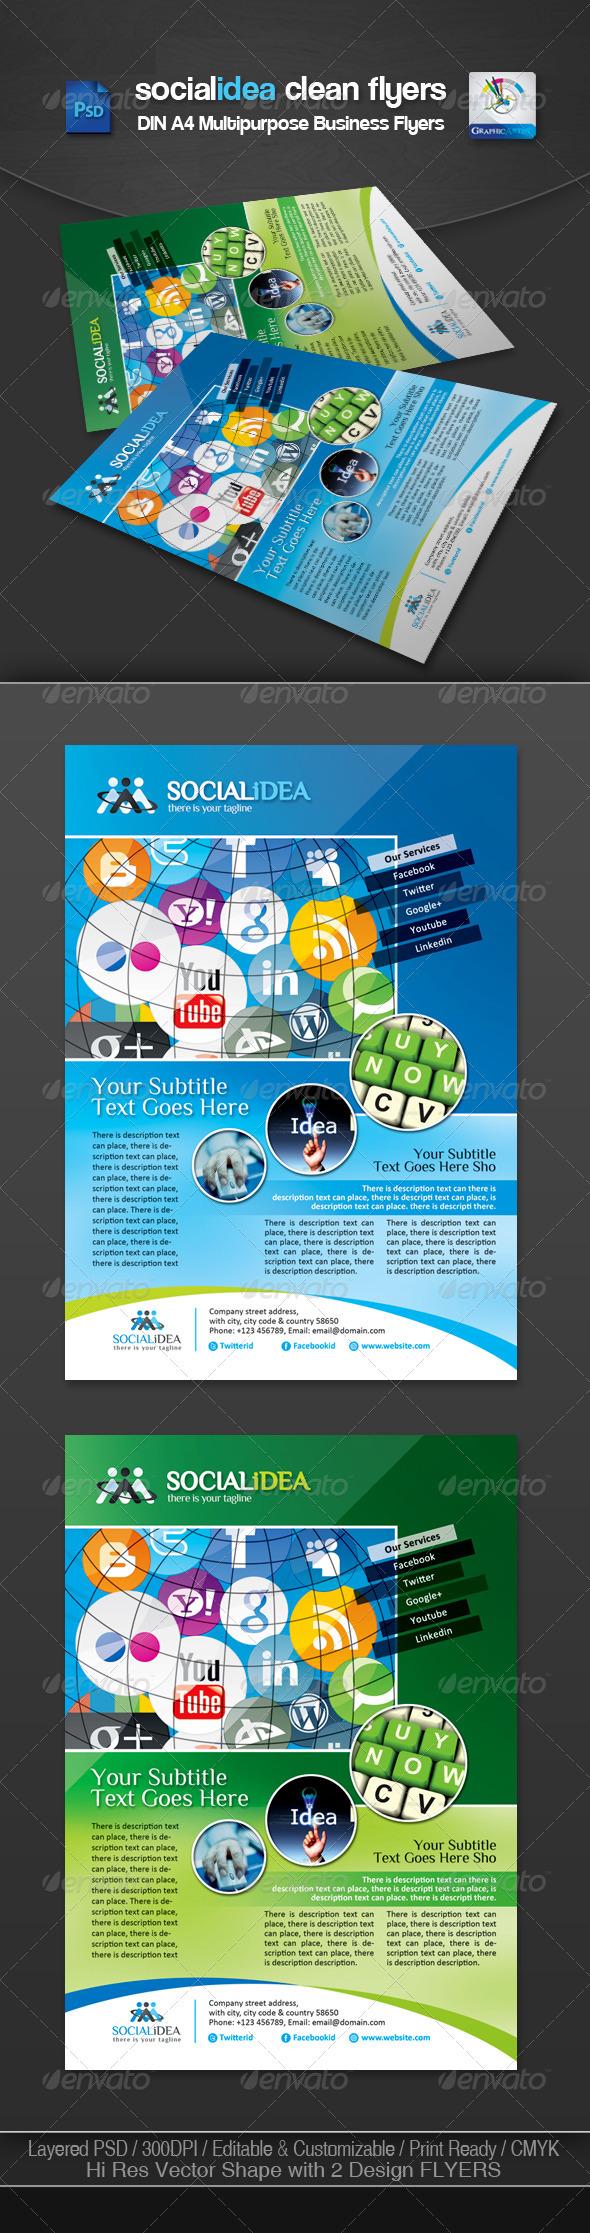 Socialidea Corporate Social Media Flyer/Ads - Corporate Flyers